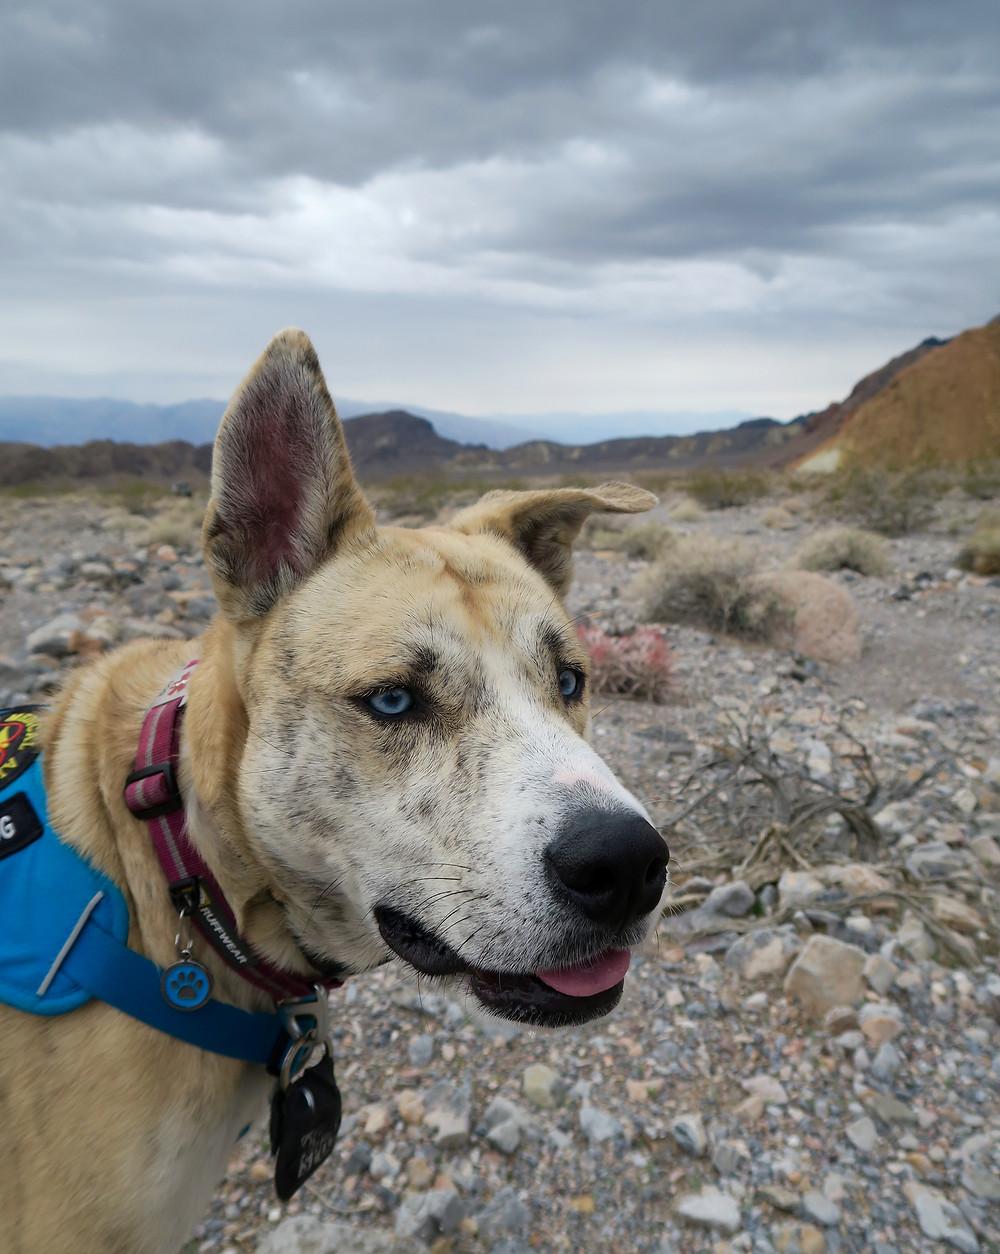 Close up of Elu's alert face, dark clouds overhead. Photo by Tenley Lozano.